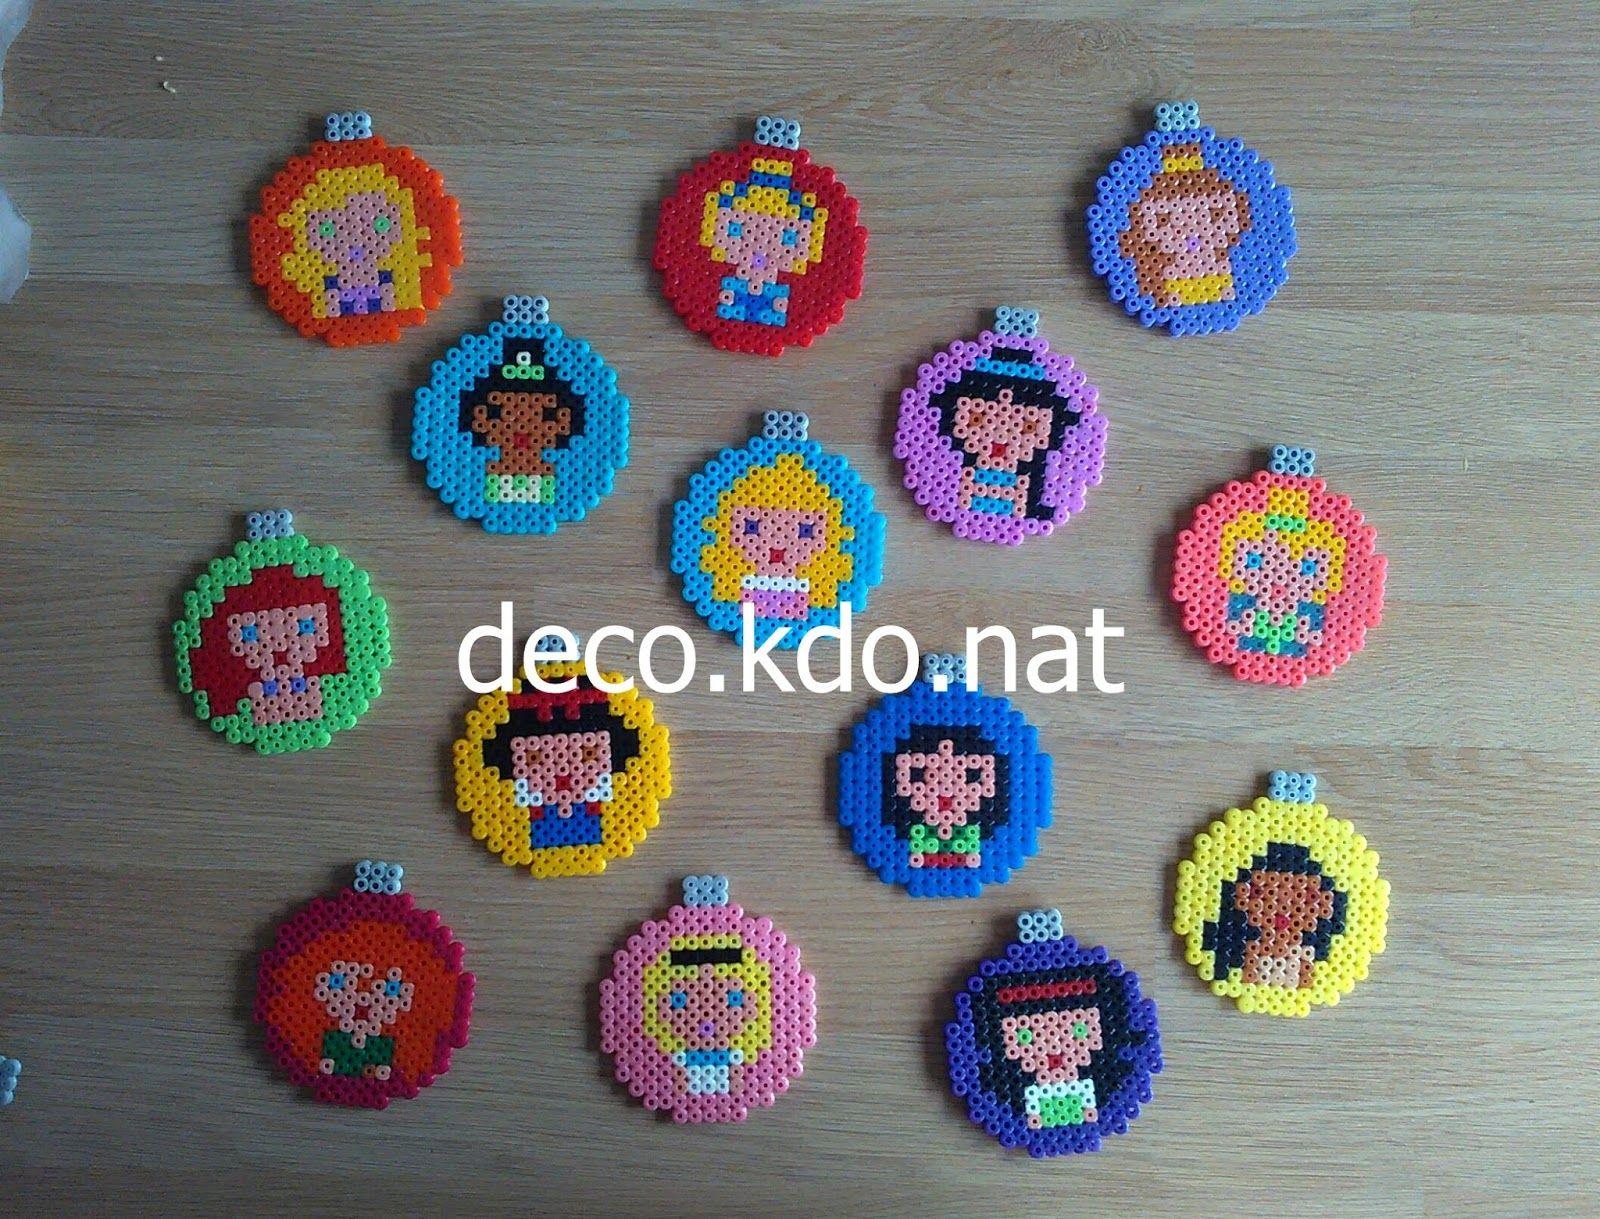 Perles Hama Boules De Noel Princesses Pm Hama Beads Disney Motifs Perles Hama Perles A Tisser